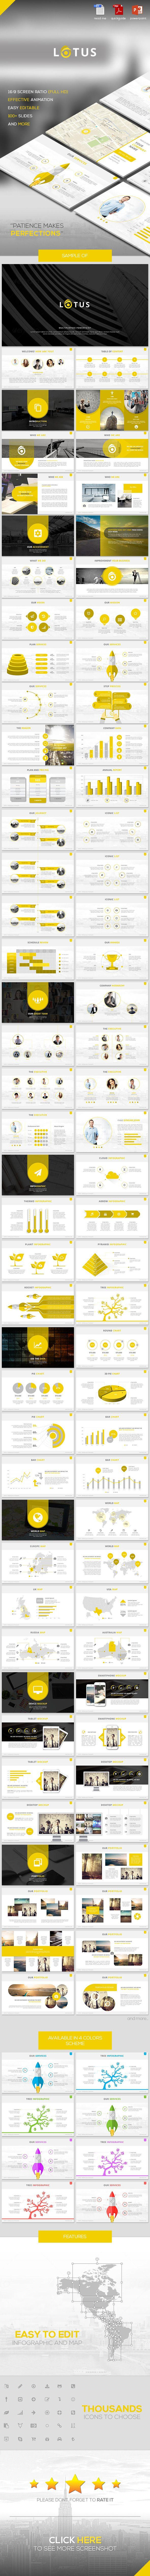 Lotus - Multipurpose Powerpoint Template #design #slides #presentation Download: http://graphicriver.net/item/lotus-multipurpose-powerpoint-template/13159523?ref=ksioks